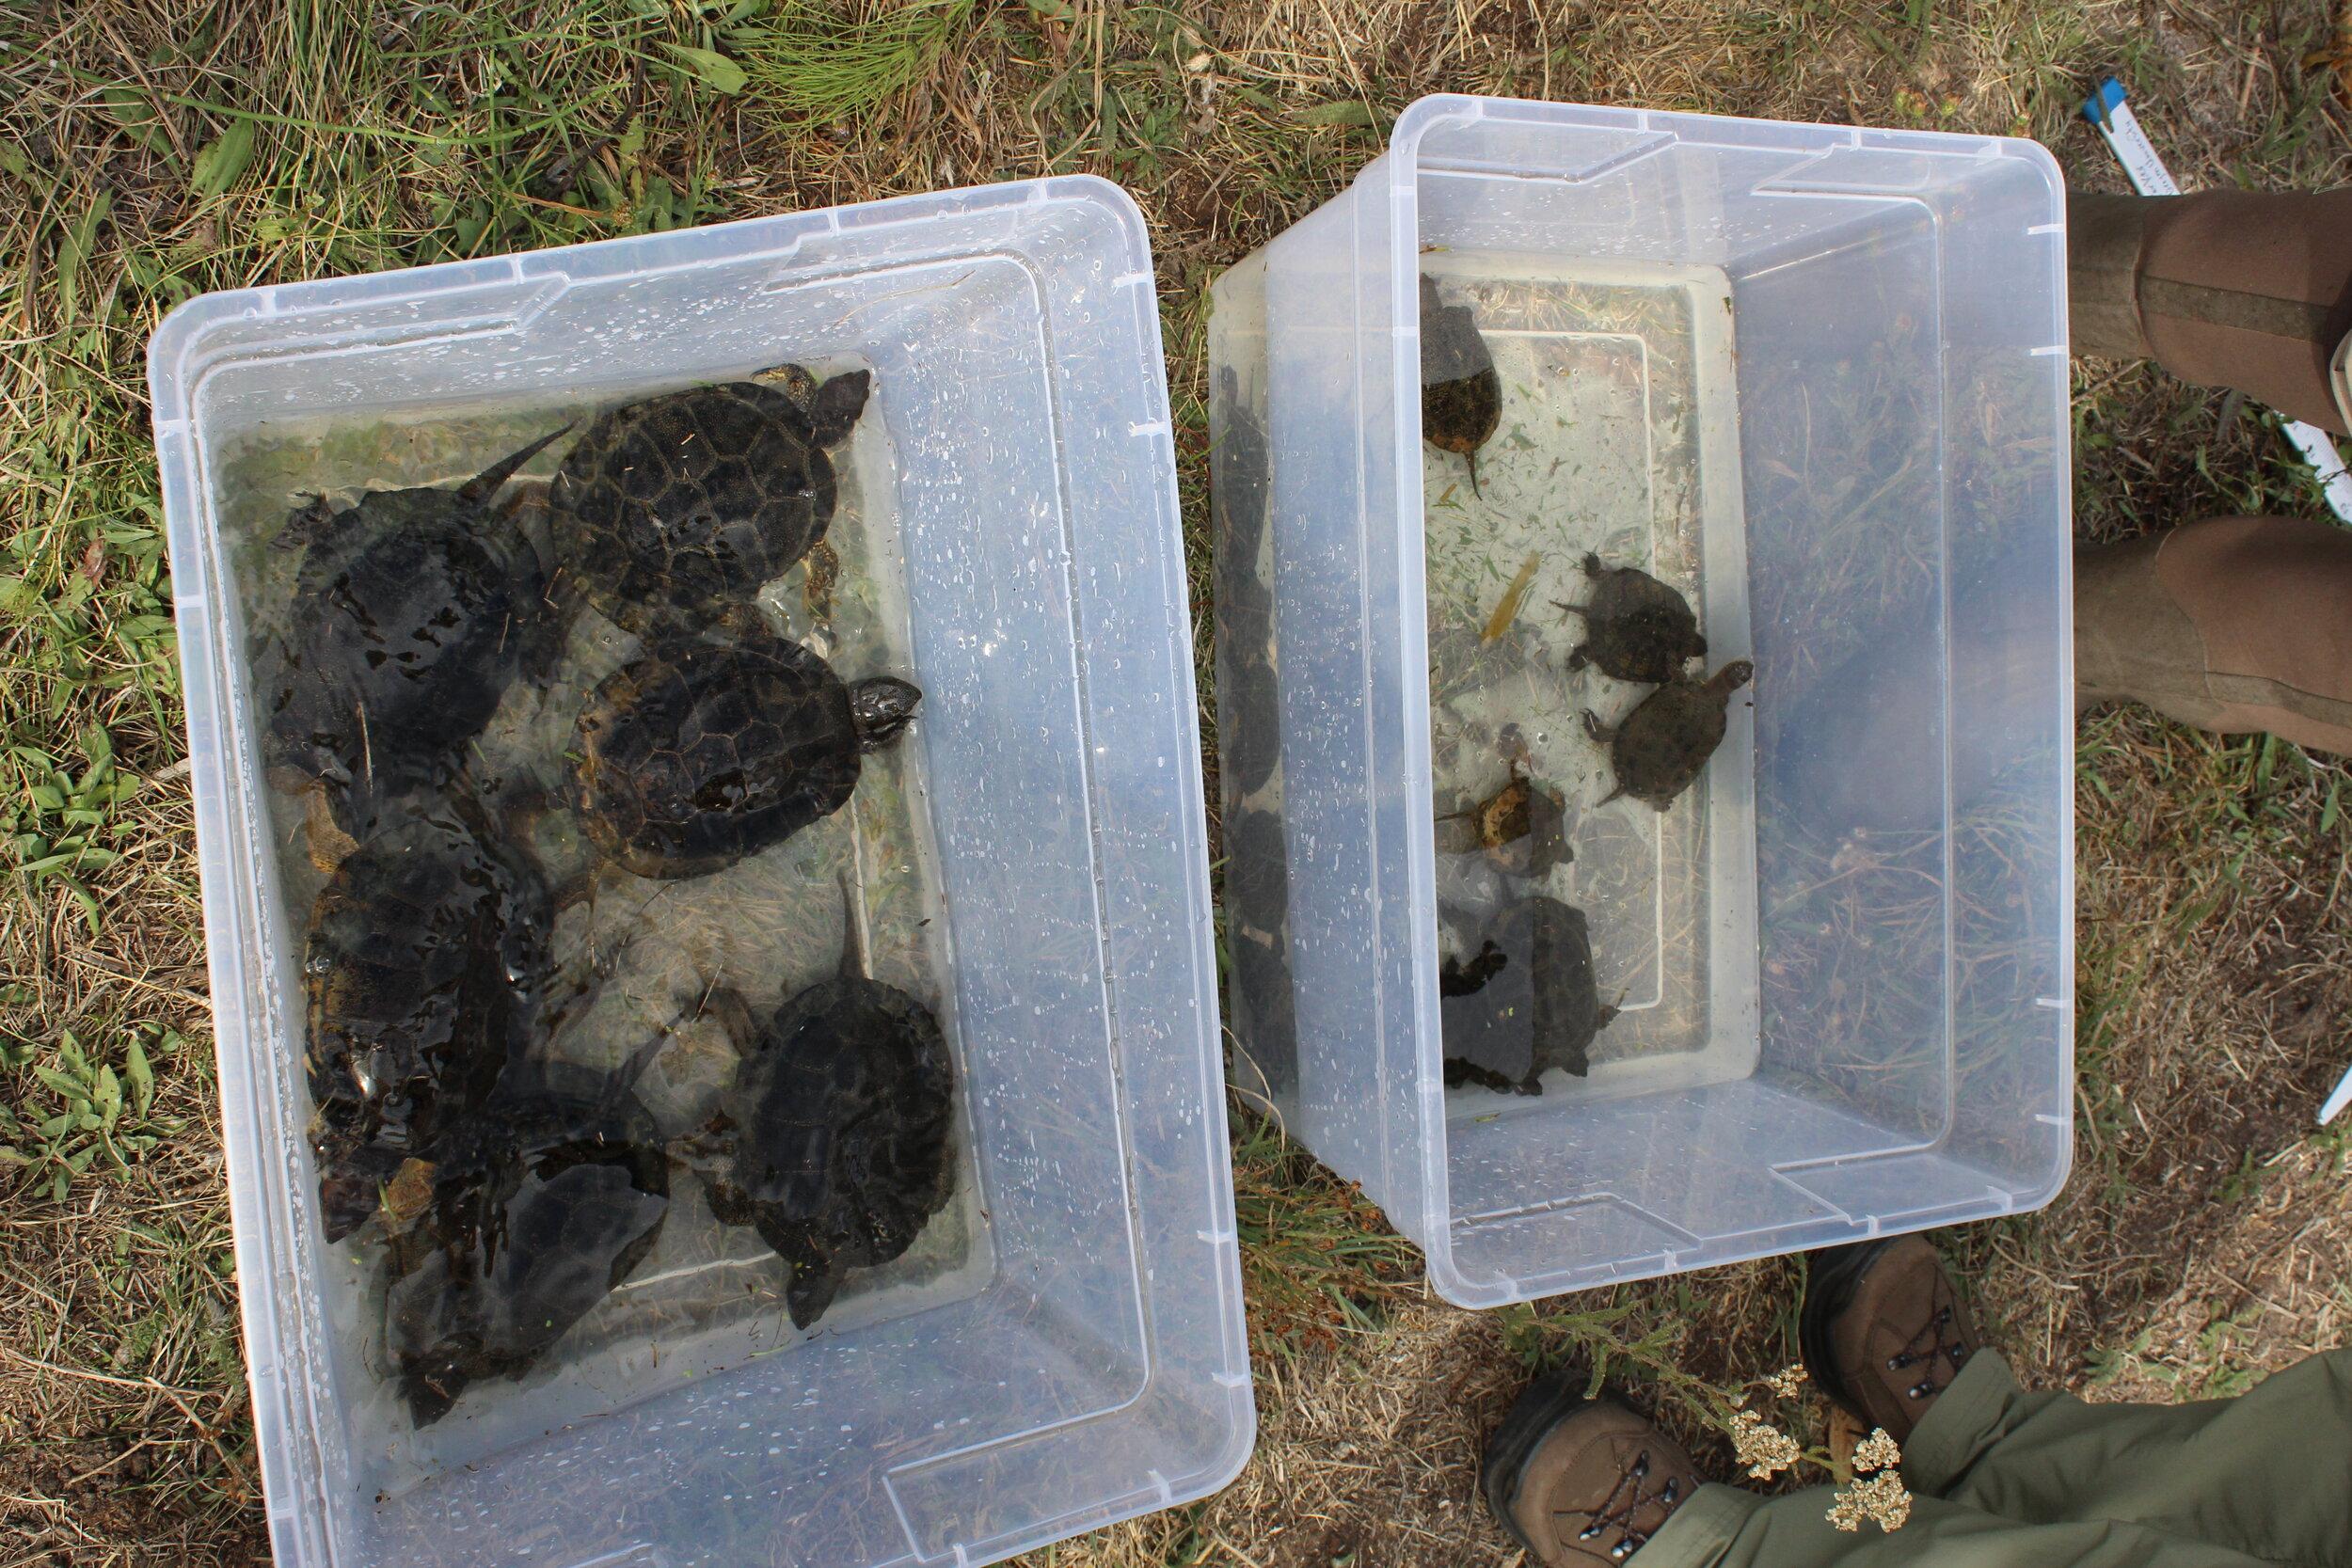 We caught 19 turtles!